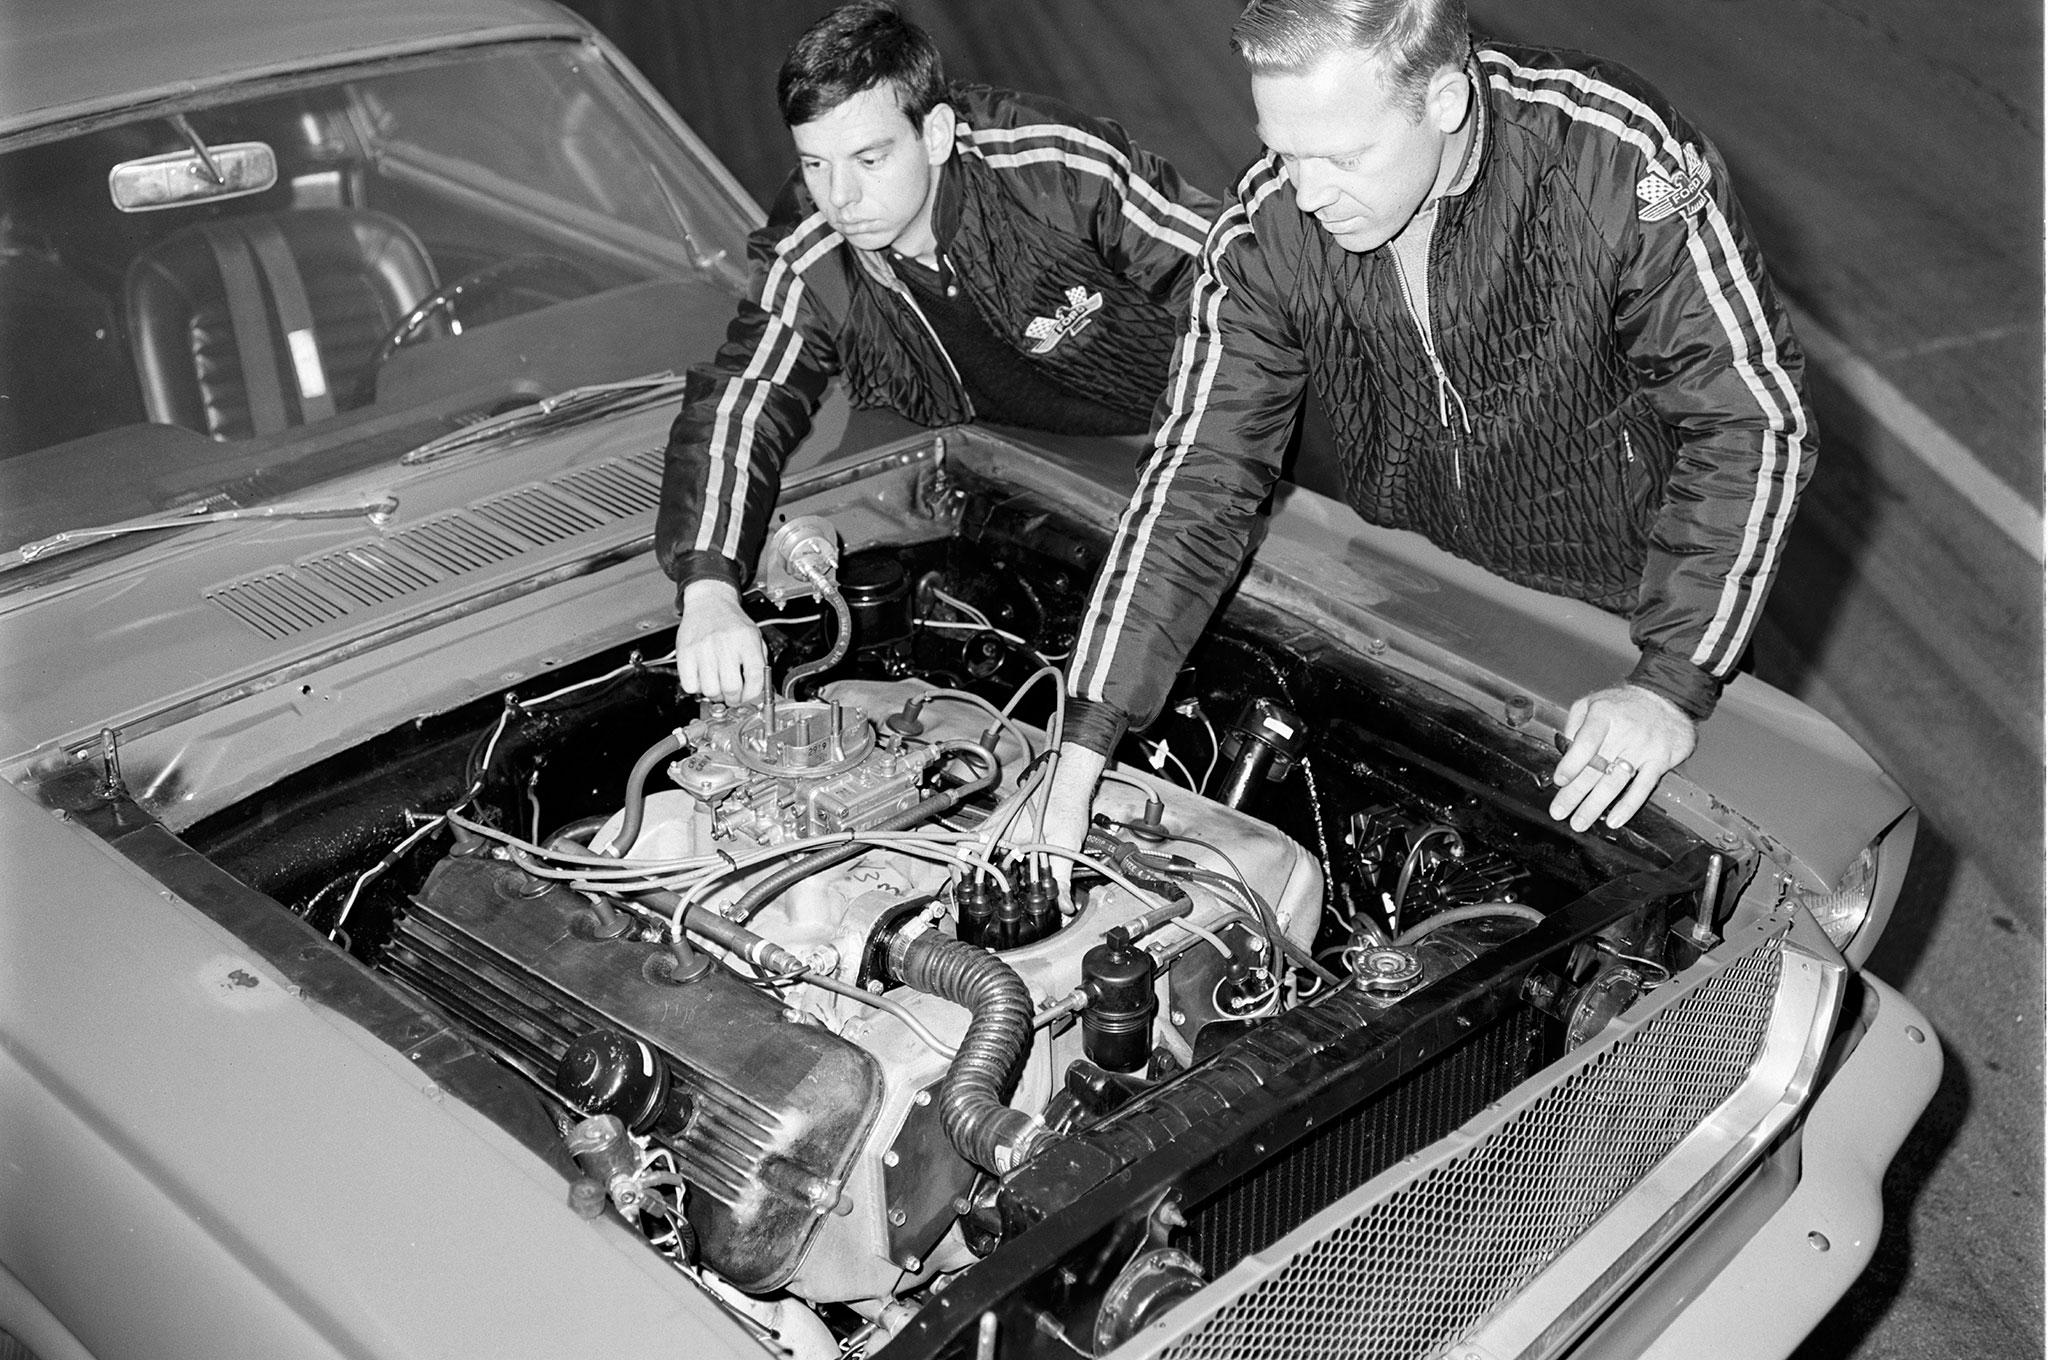 1964 Mustang Cammer 427 Sohc